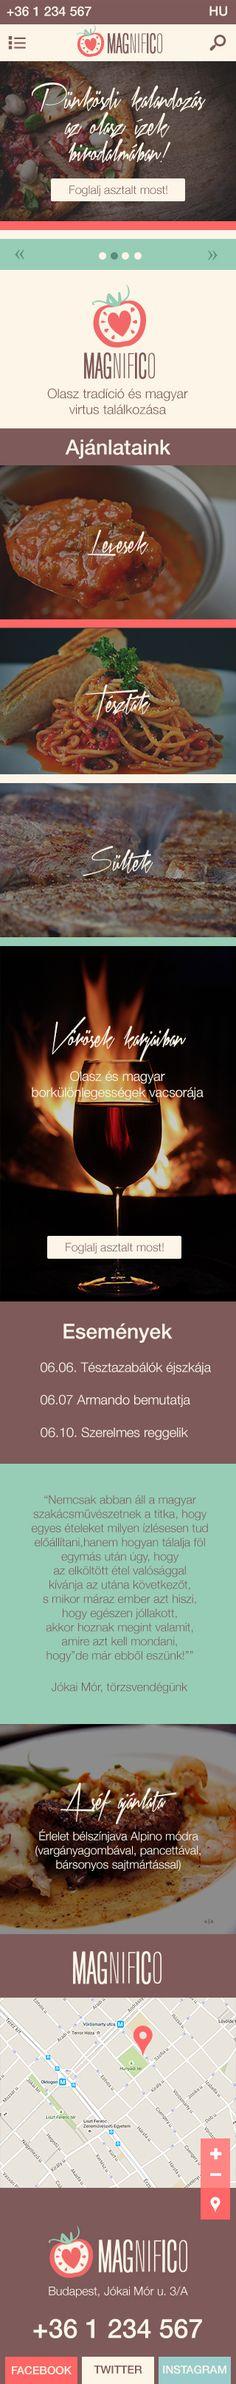 Morell Eszter - Magnifico mobil terv